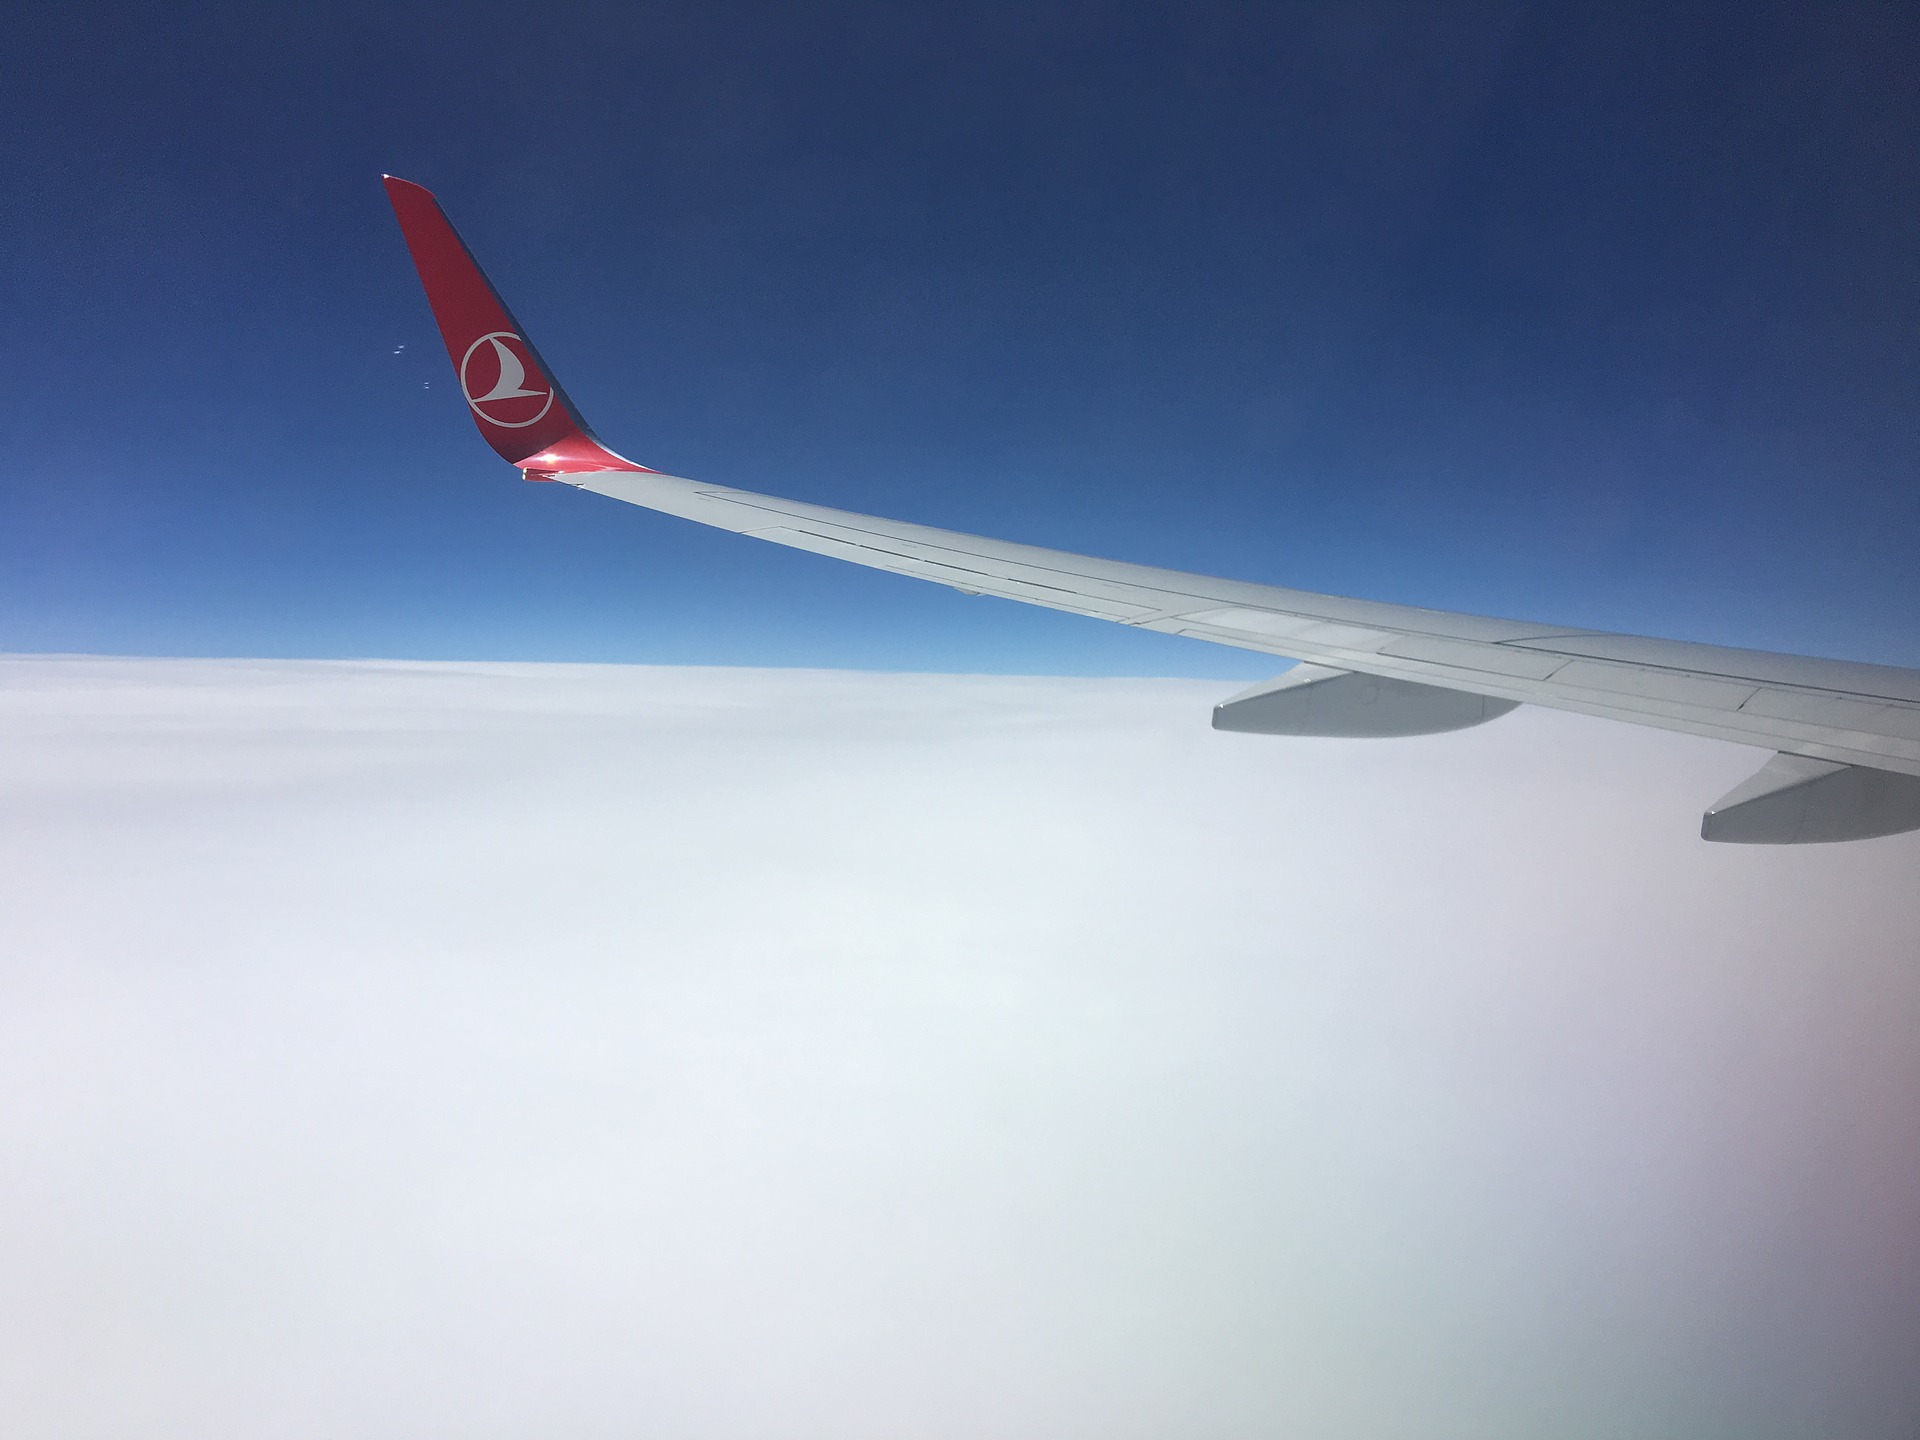 turkish-airlines-1940463_1920